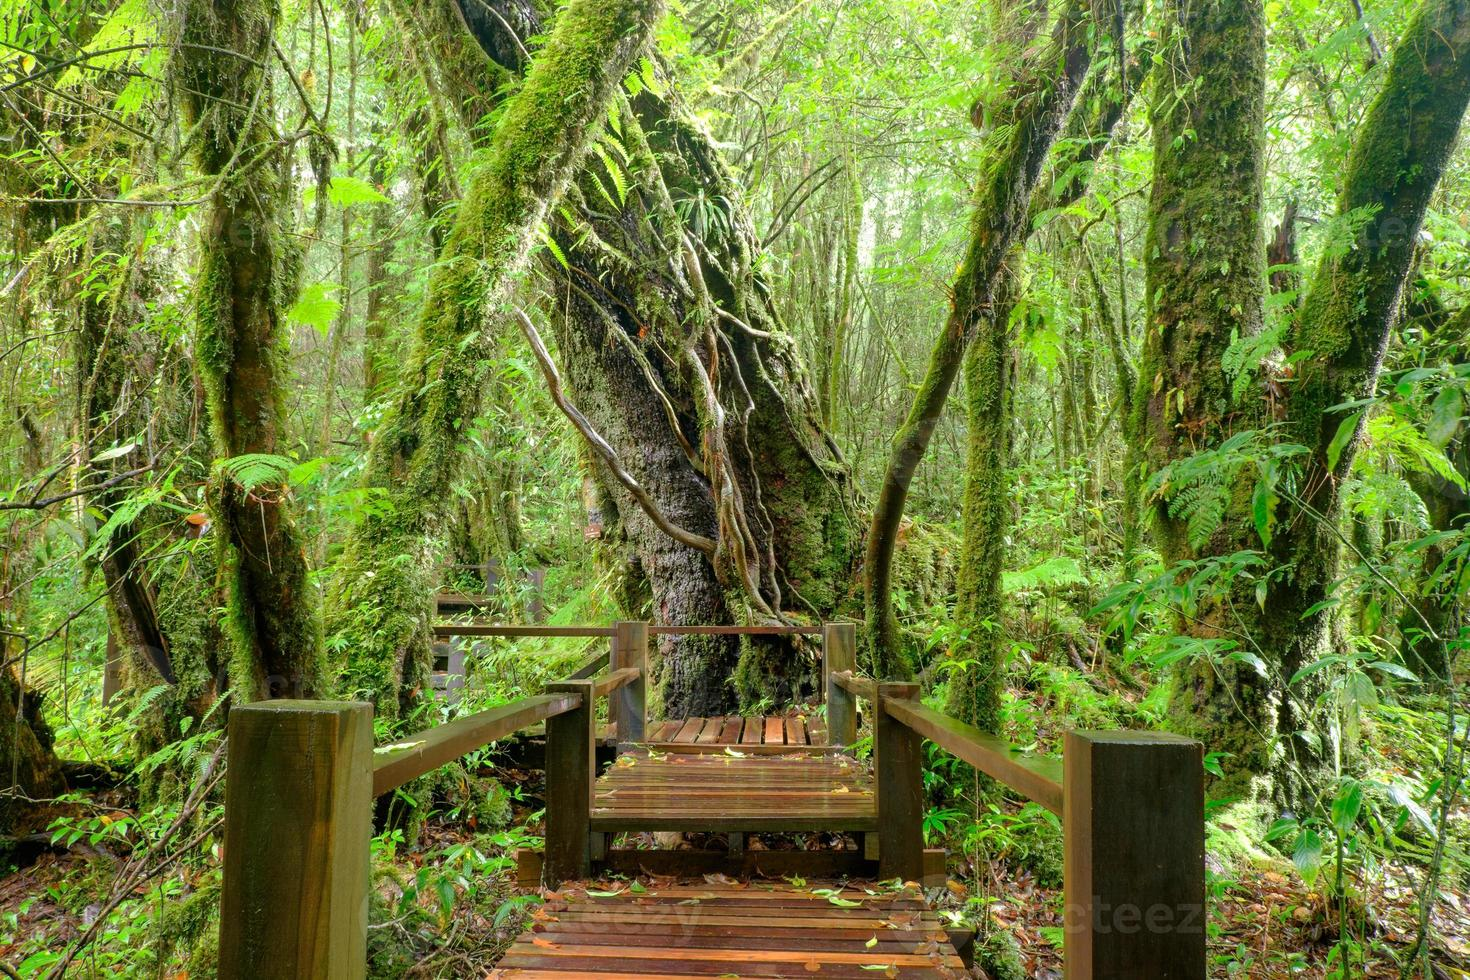 bosque tropical foto